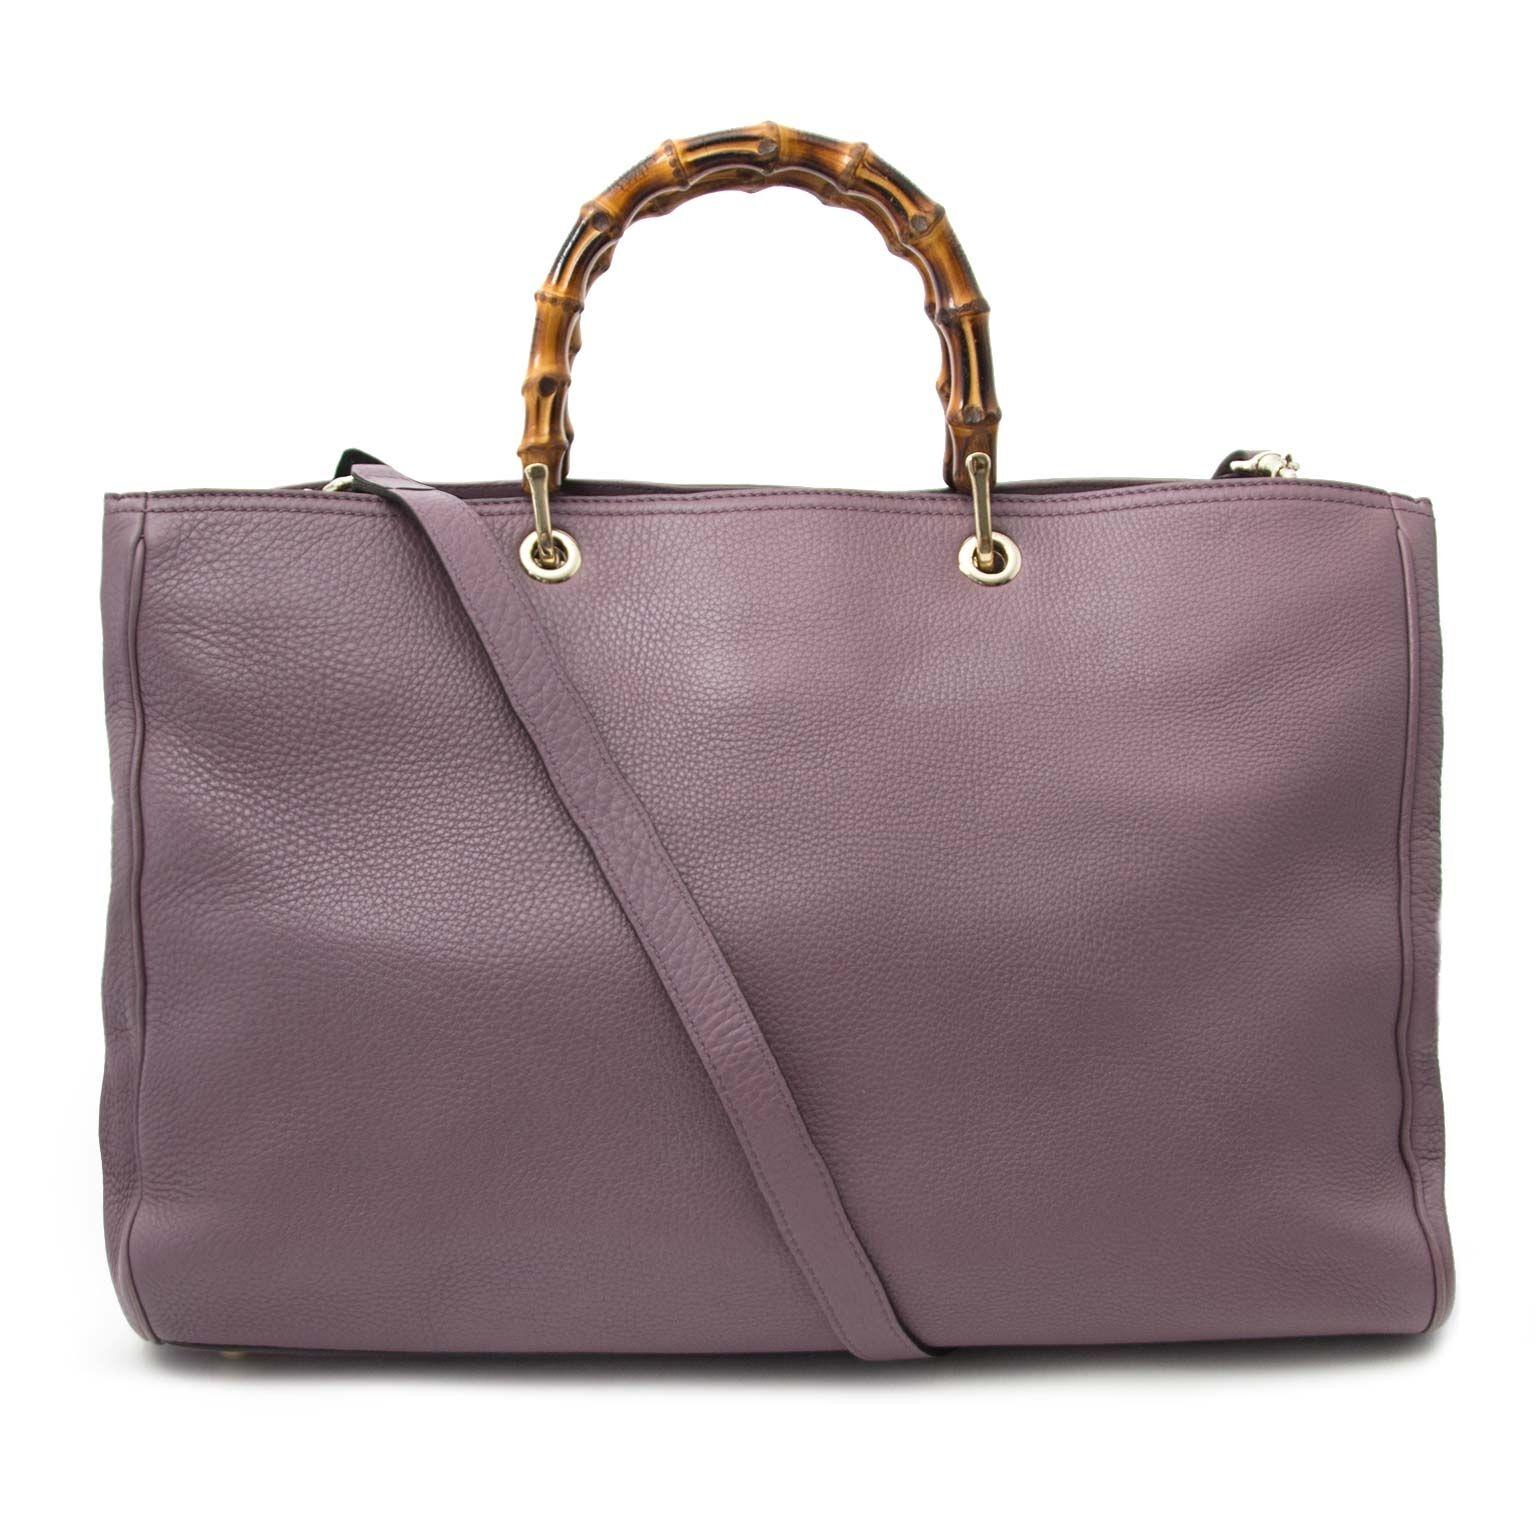 68dab8820e7 Labellov The Gucci Edit - MAGAZINE ○ Buy and Sell Authentic Luxury